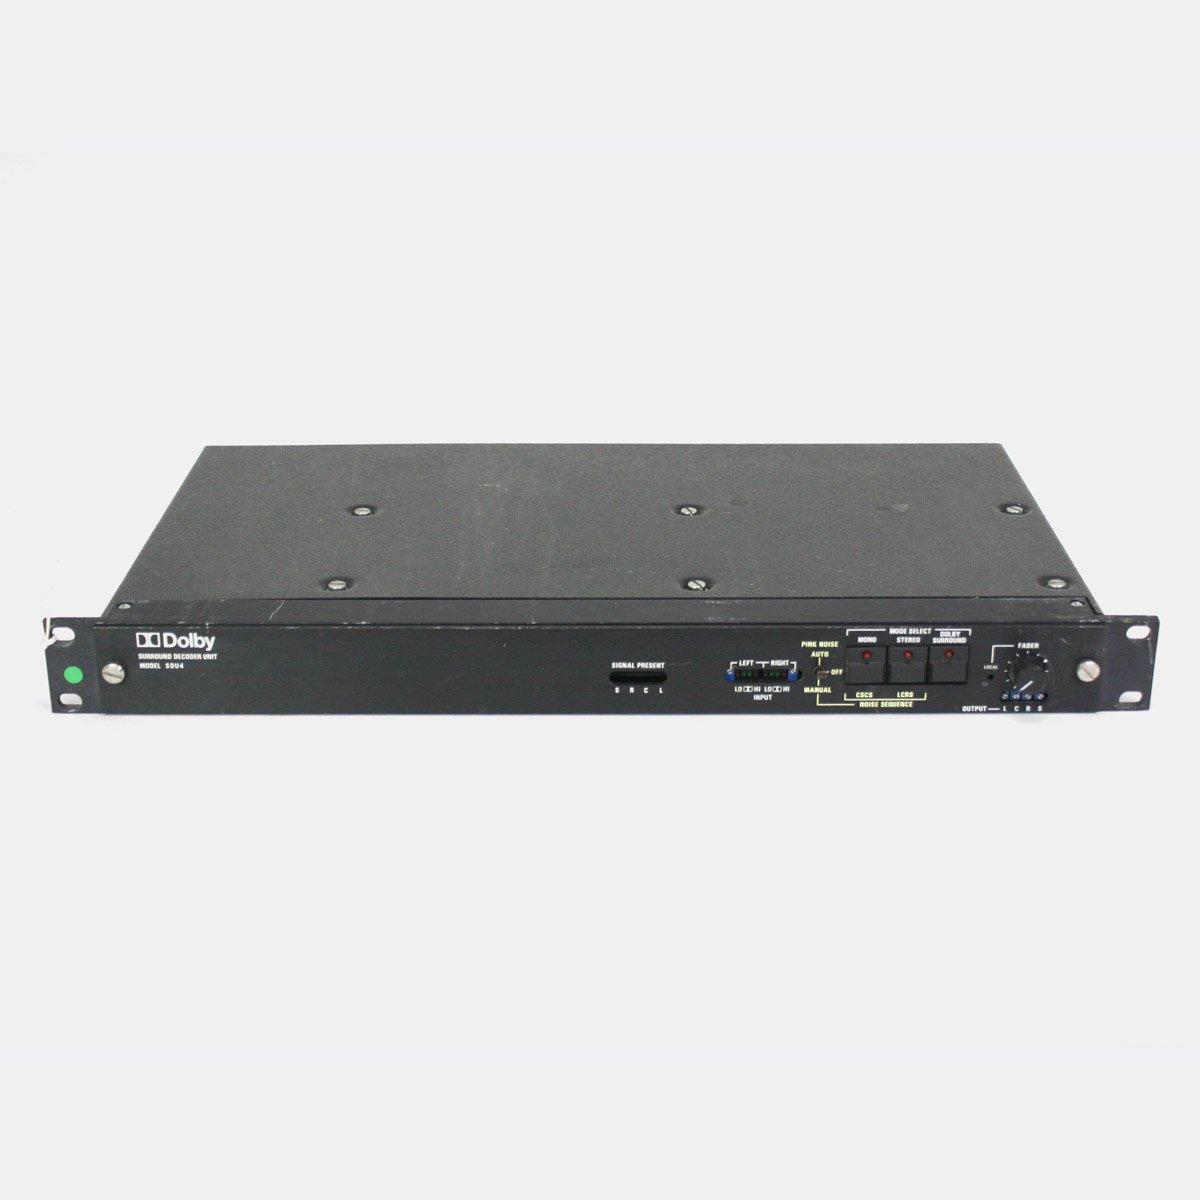 Used Dolby SDU4 Surround Decoder